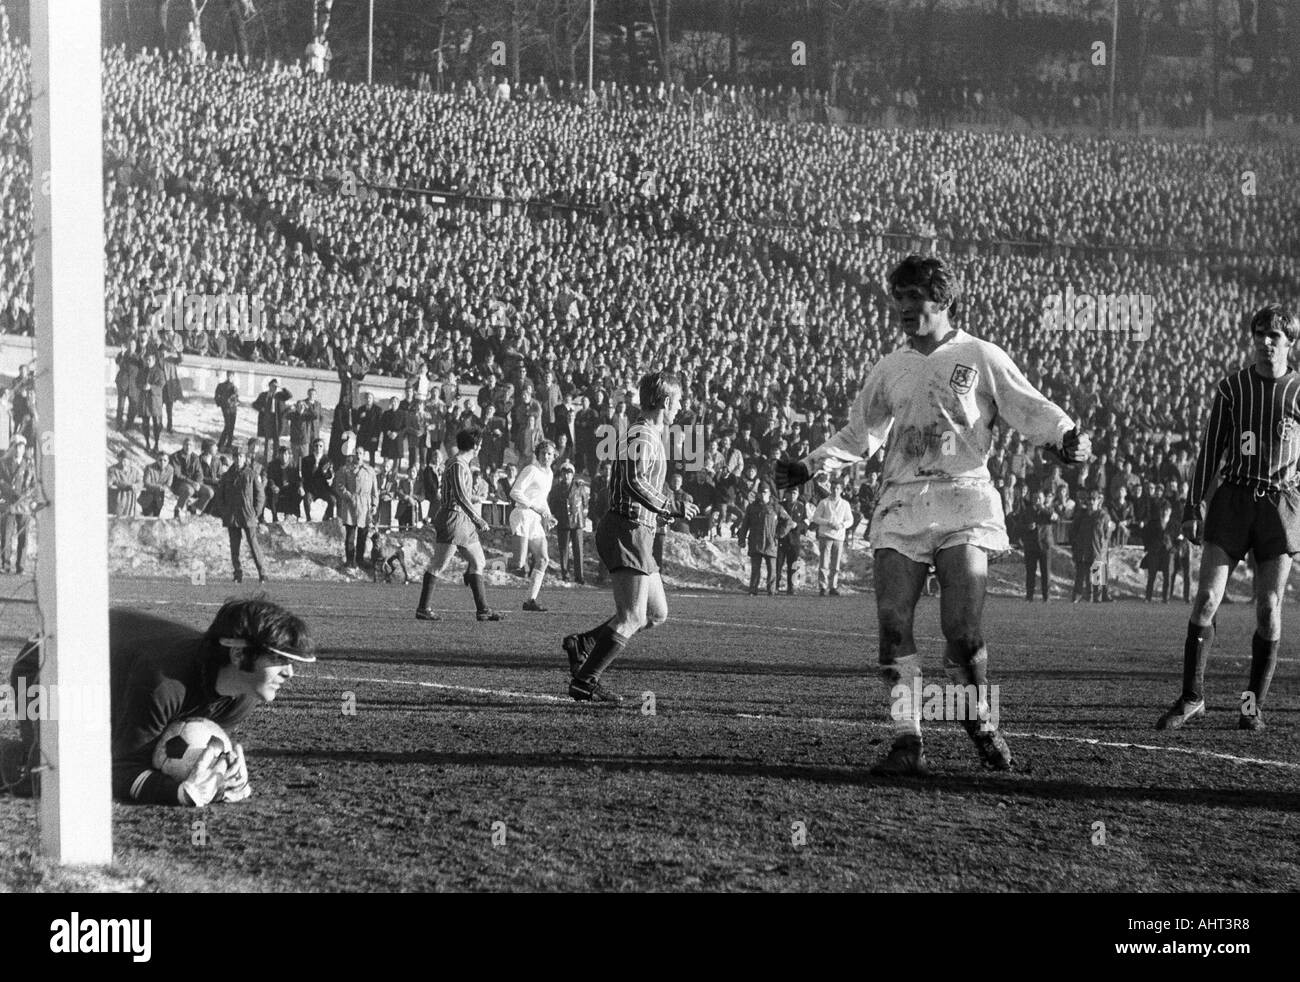 football, Regionalliga West, 1970/1971, Stadium am Zoo in Wuppertal, Wuppertaler SV versus Fortuna Duesseldorf 1:1, scene of the match, f.l.t.r. keeper Bernd Franke (Ddorf), Klaus Iwanzik (Ddorf), Guenter Proepper (WSV), Werner Kriegler (Ddorf) - Stock Image